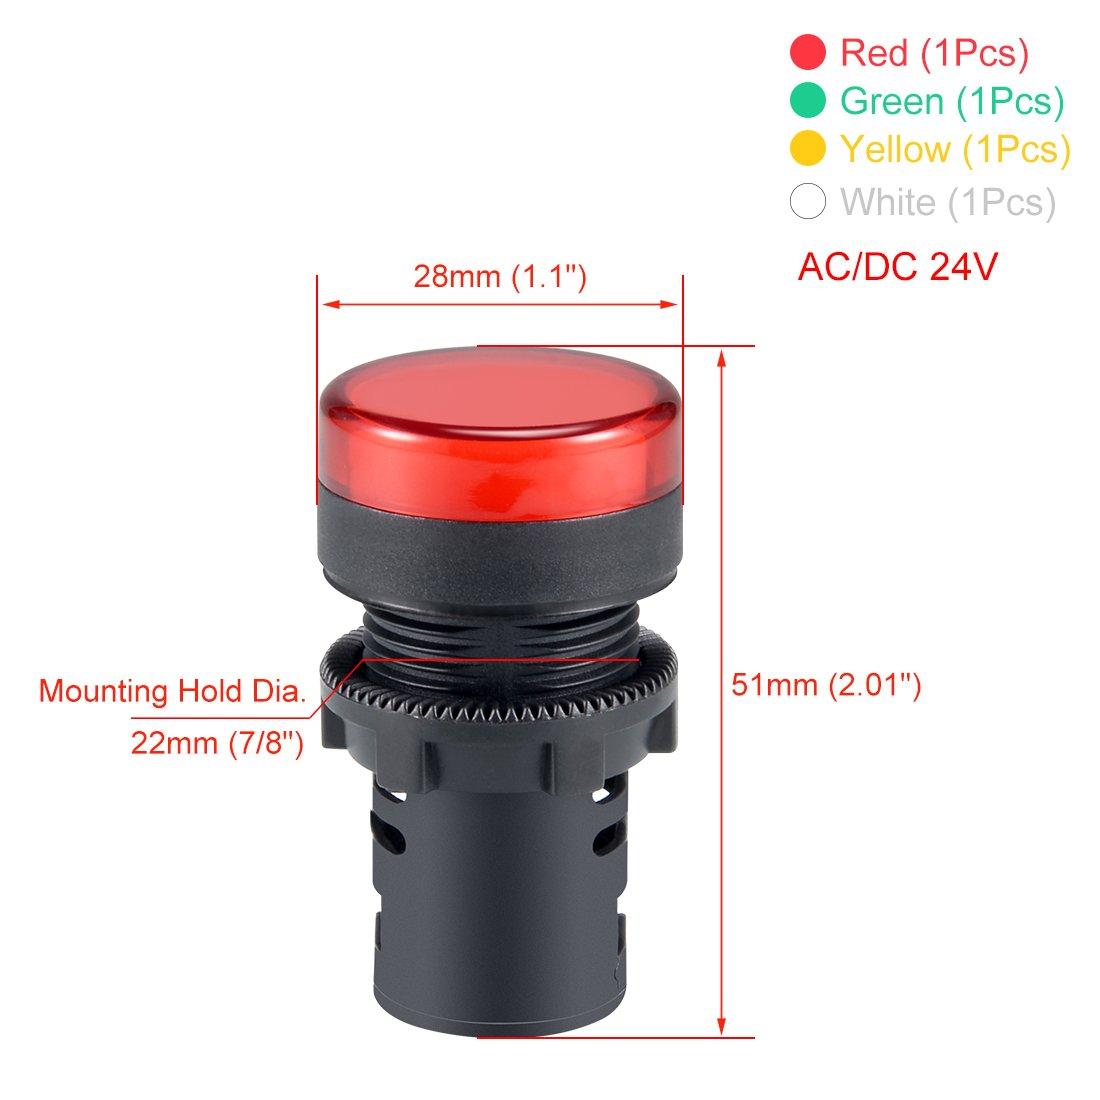 Red+Green+Yellow+White LED sourcing map 4Pcs AC//DC 24V Indicator Lights Flush Panel Mount 7//8 22mm